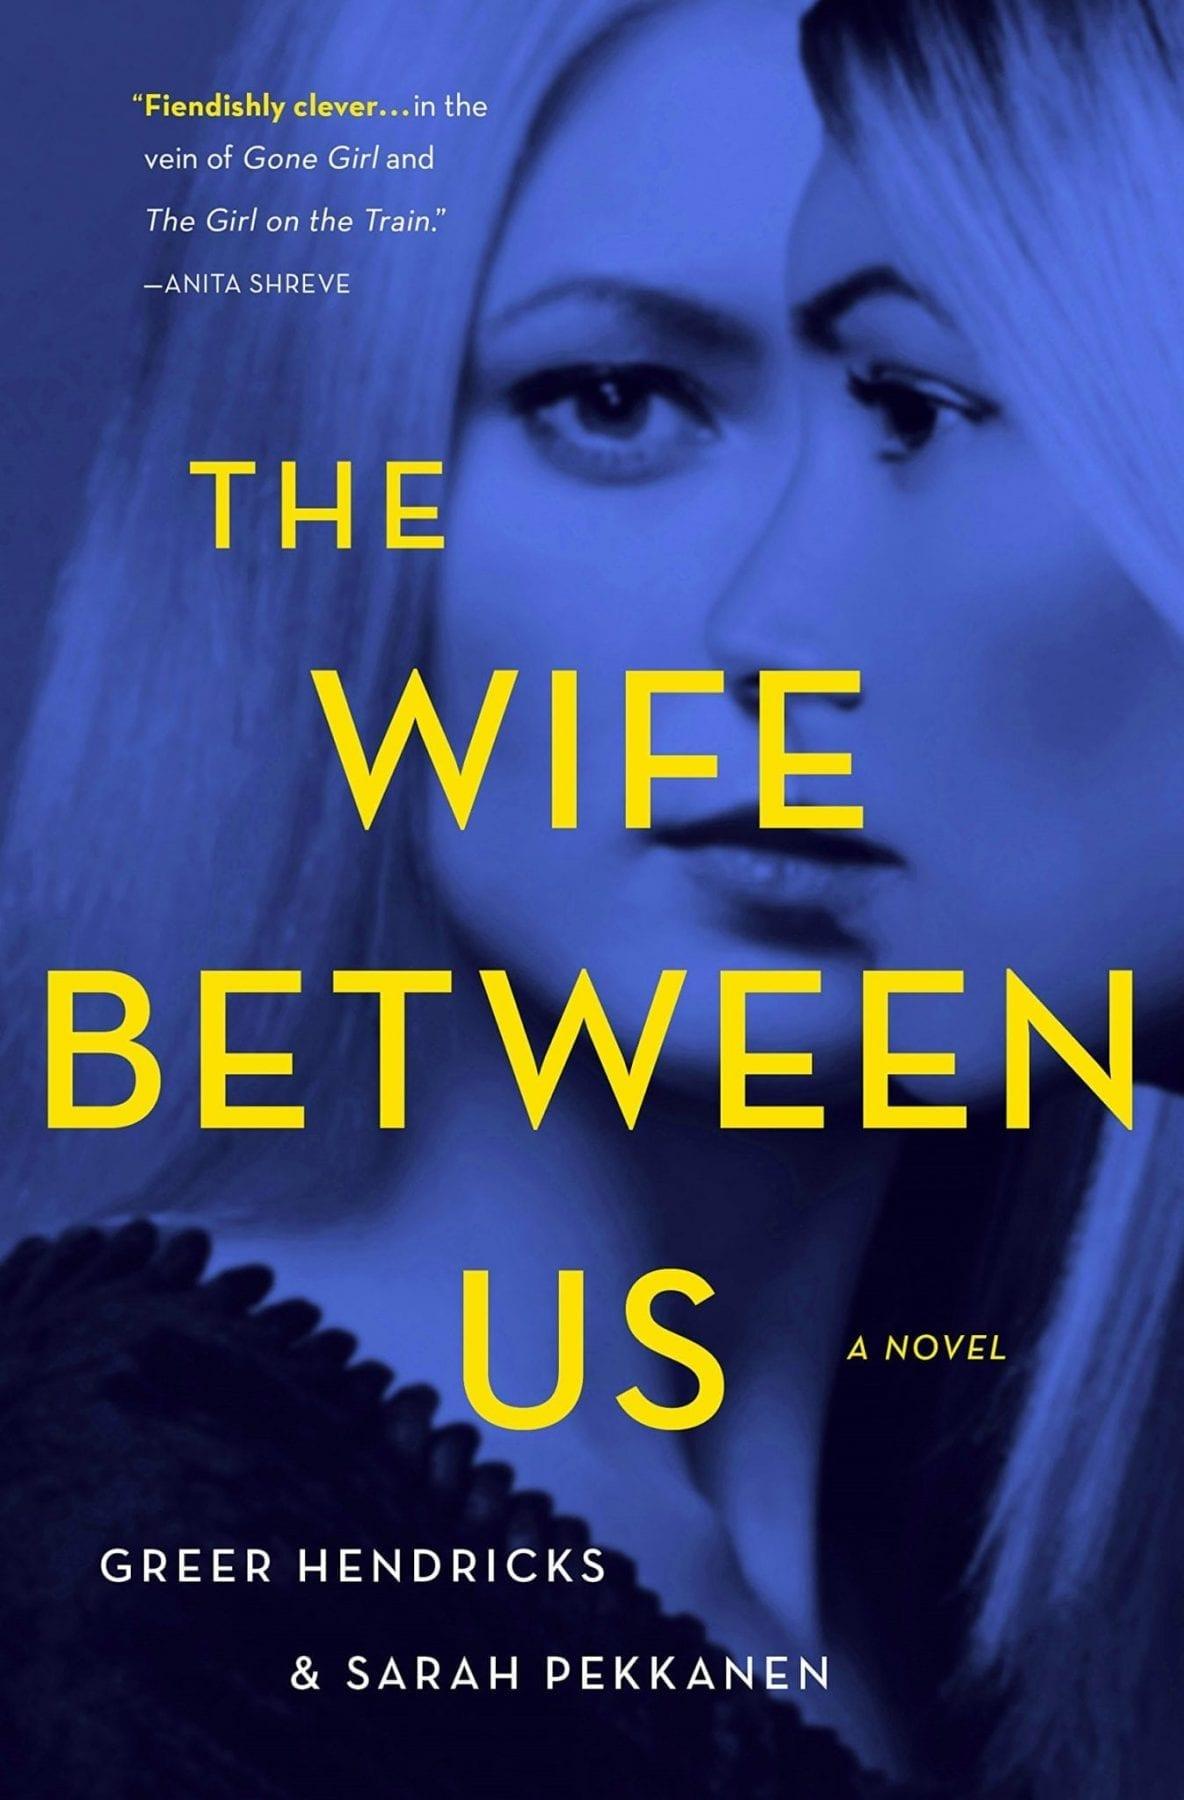 The Wife Between us by Sarah Pekkanen and Greer Hendricks